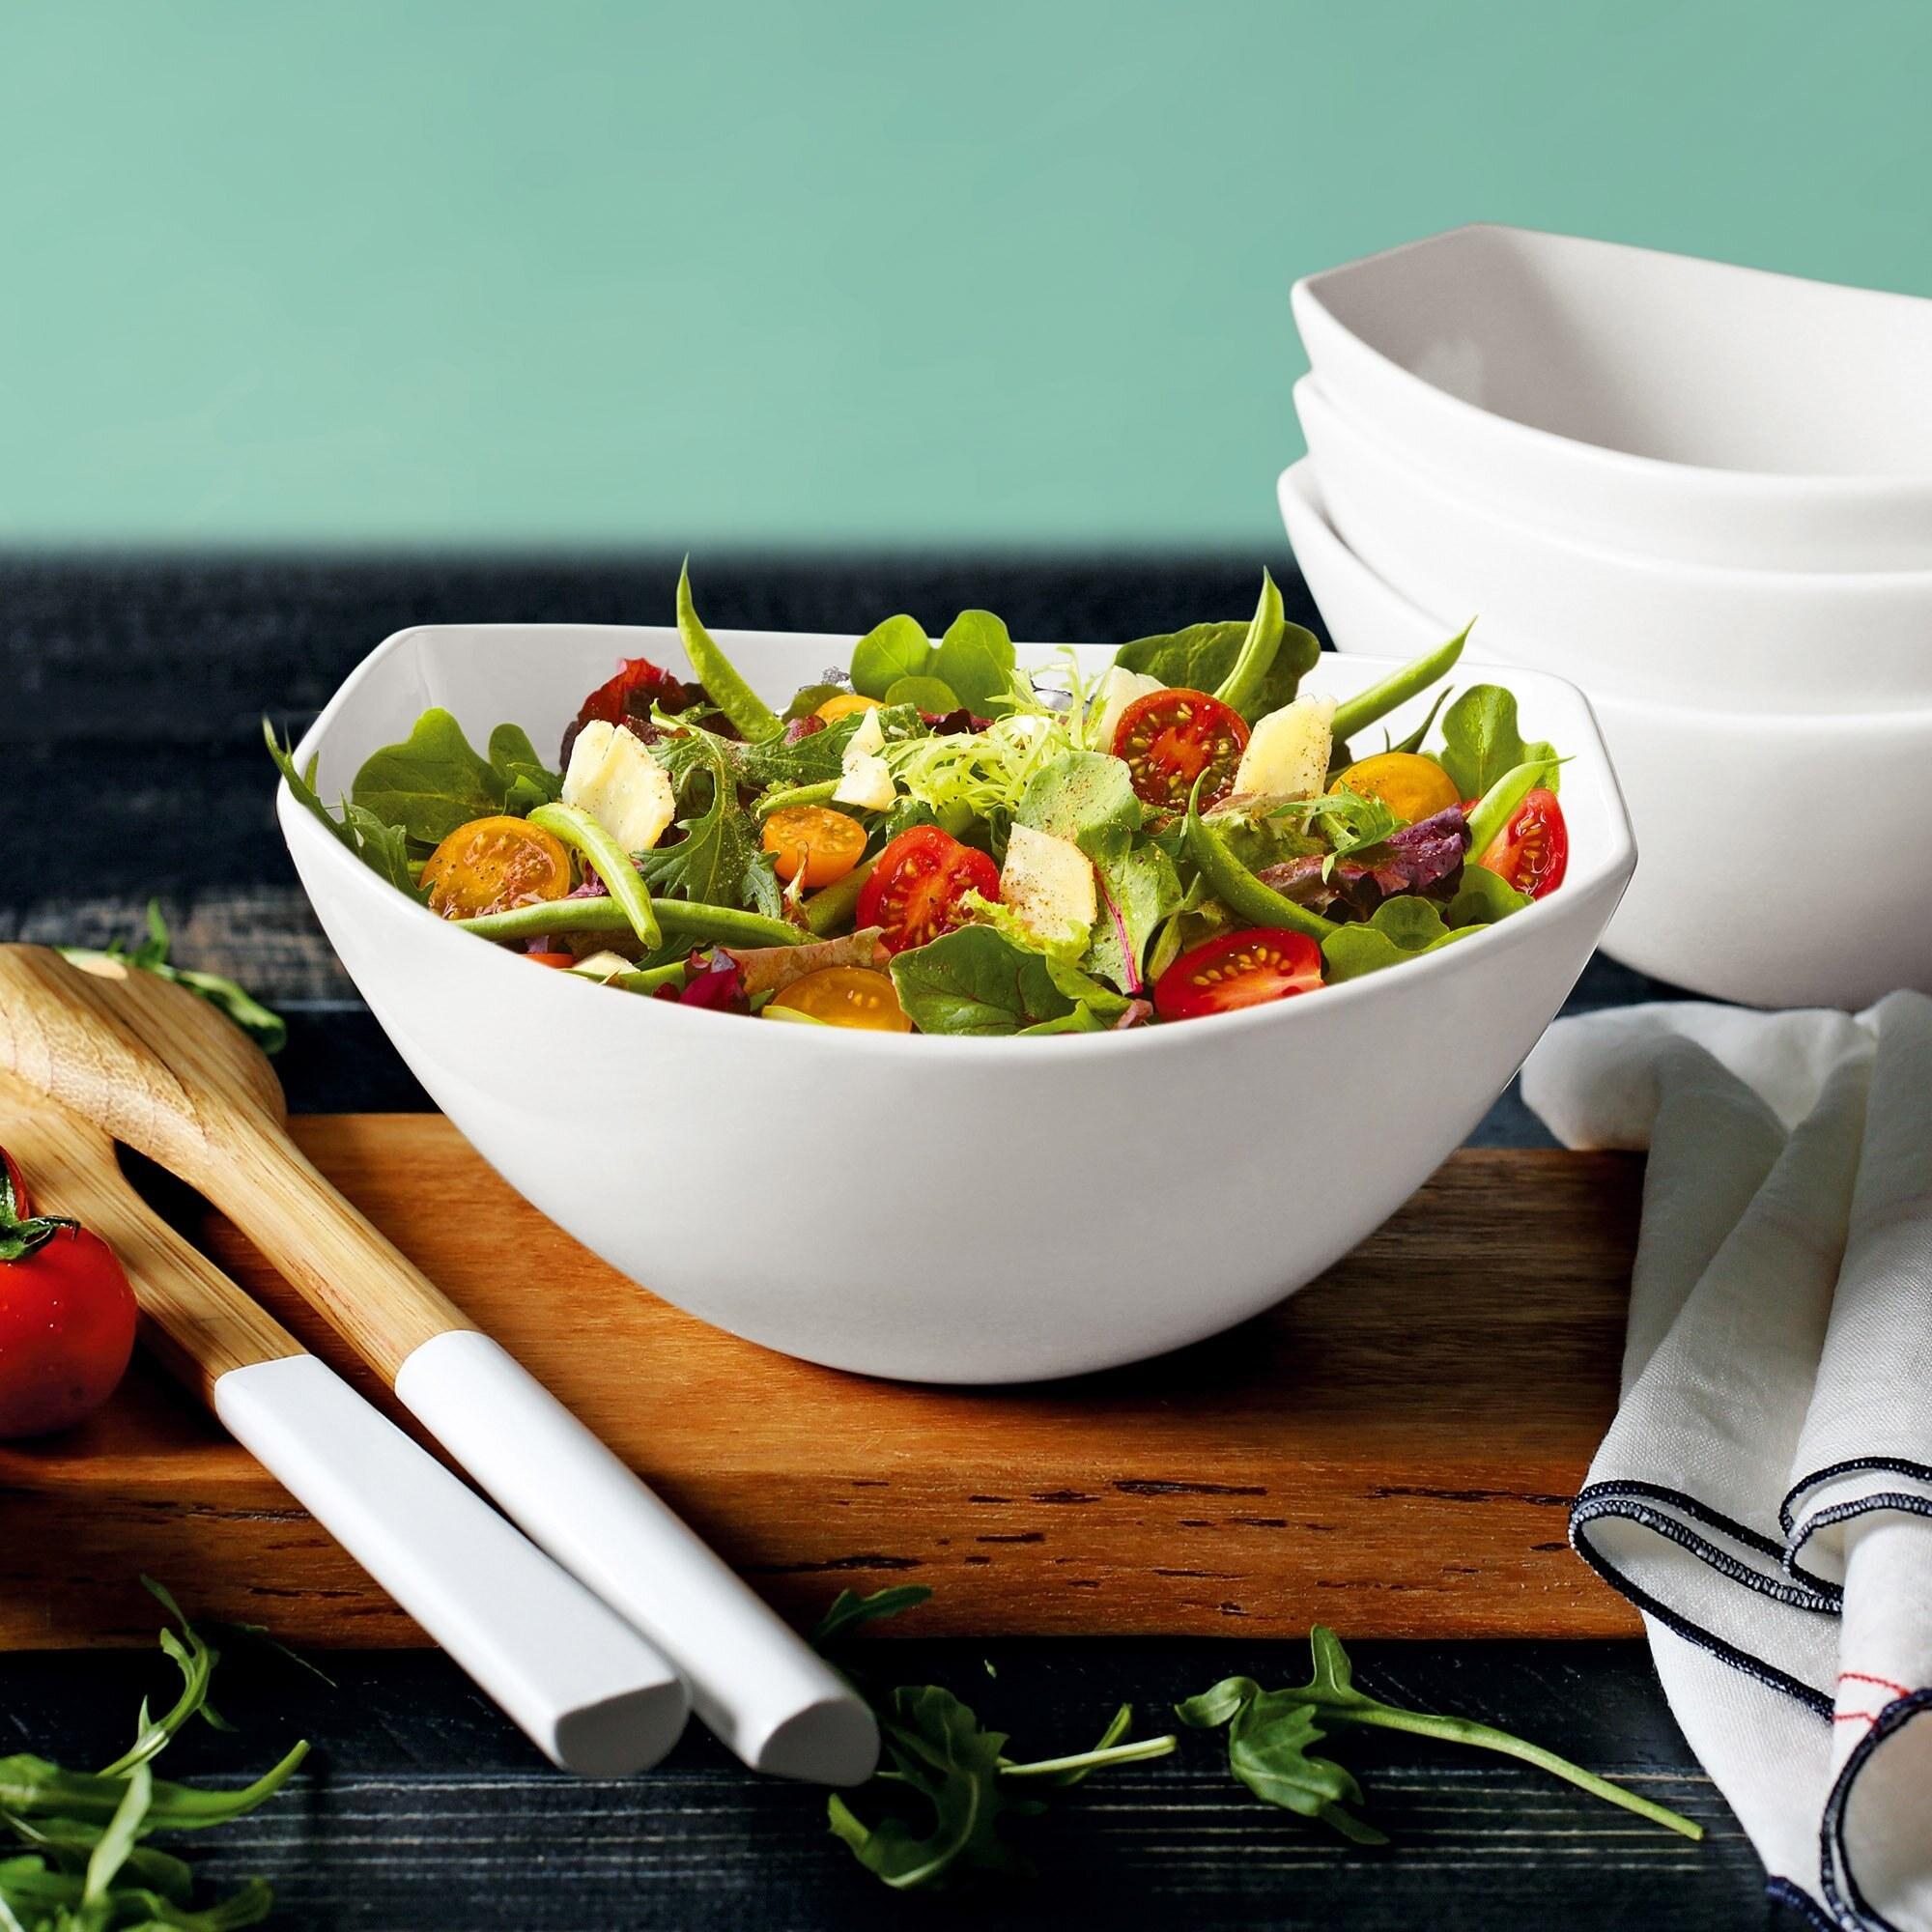 Serving bowl with salad inside